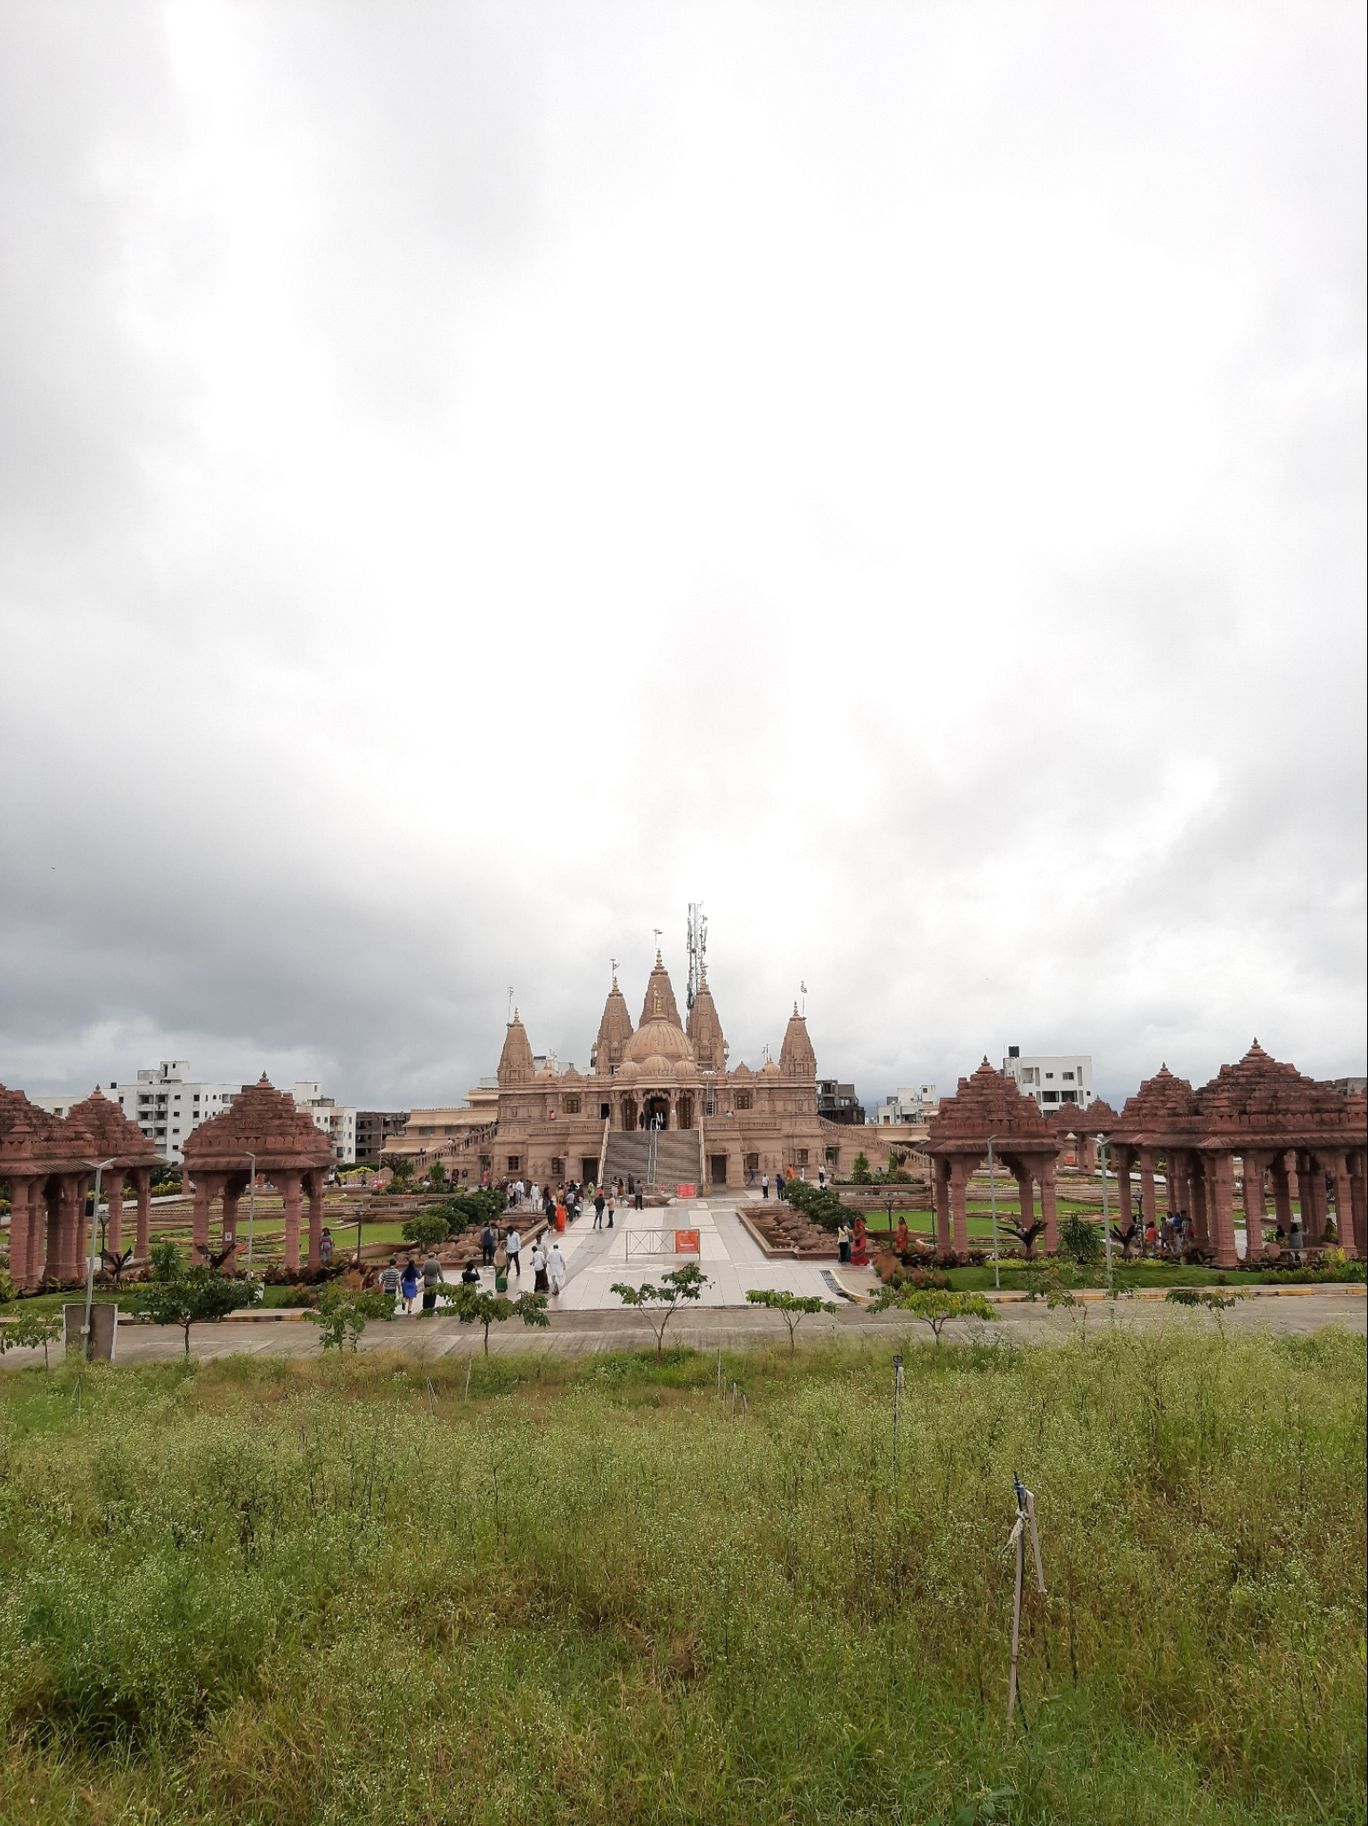 Photo of BAPS Shree Swaminarayan Mandir By Ziku Sarangi